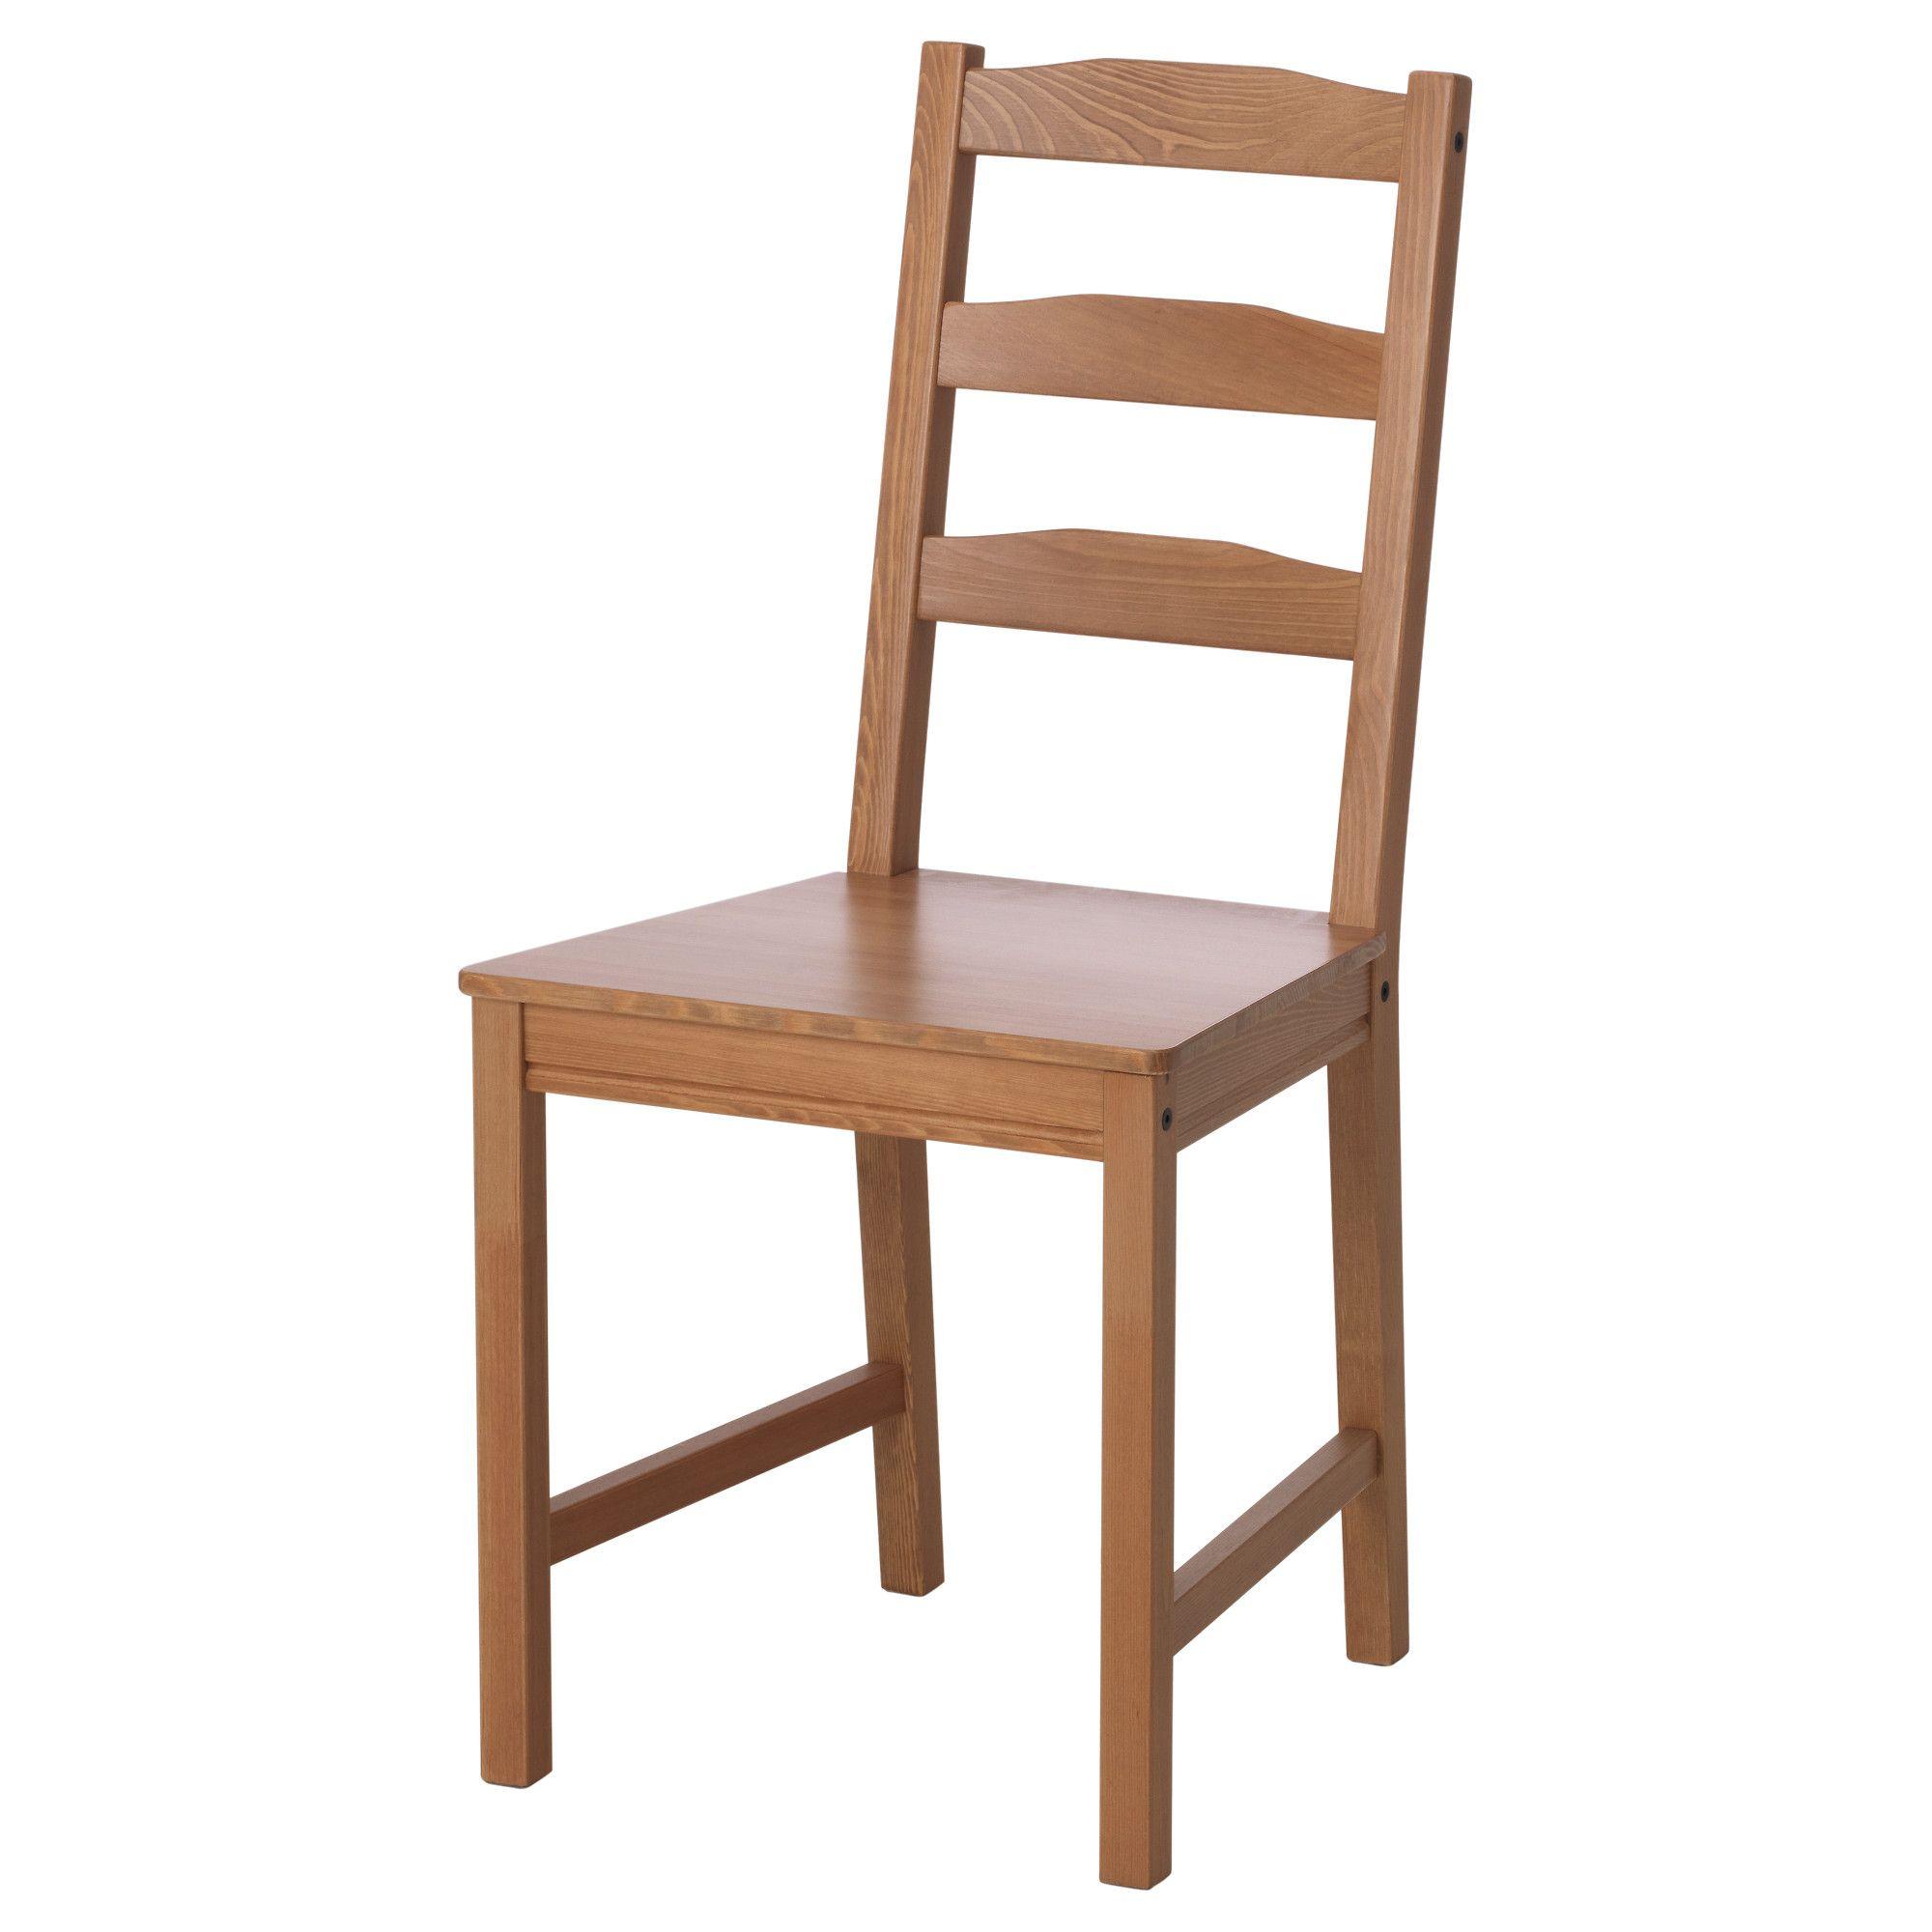 kitchen chair / เก้าอี้ห้องครัว Ikea chair, Pine chairs